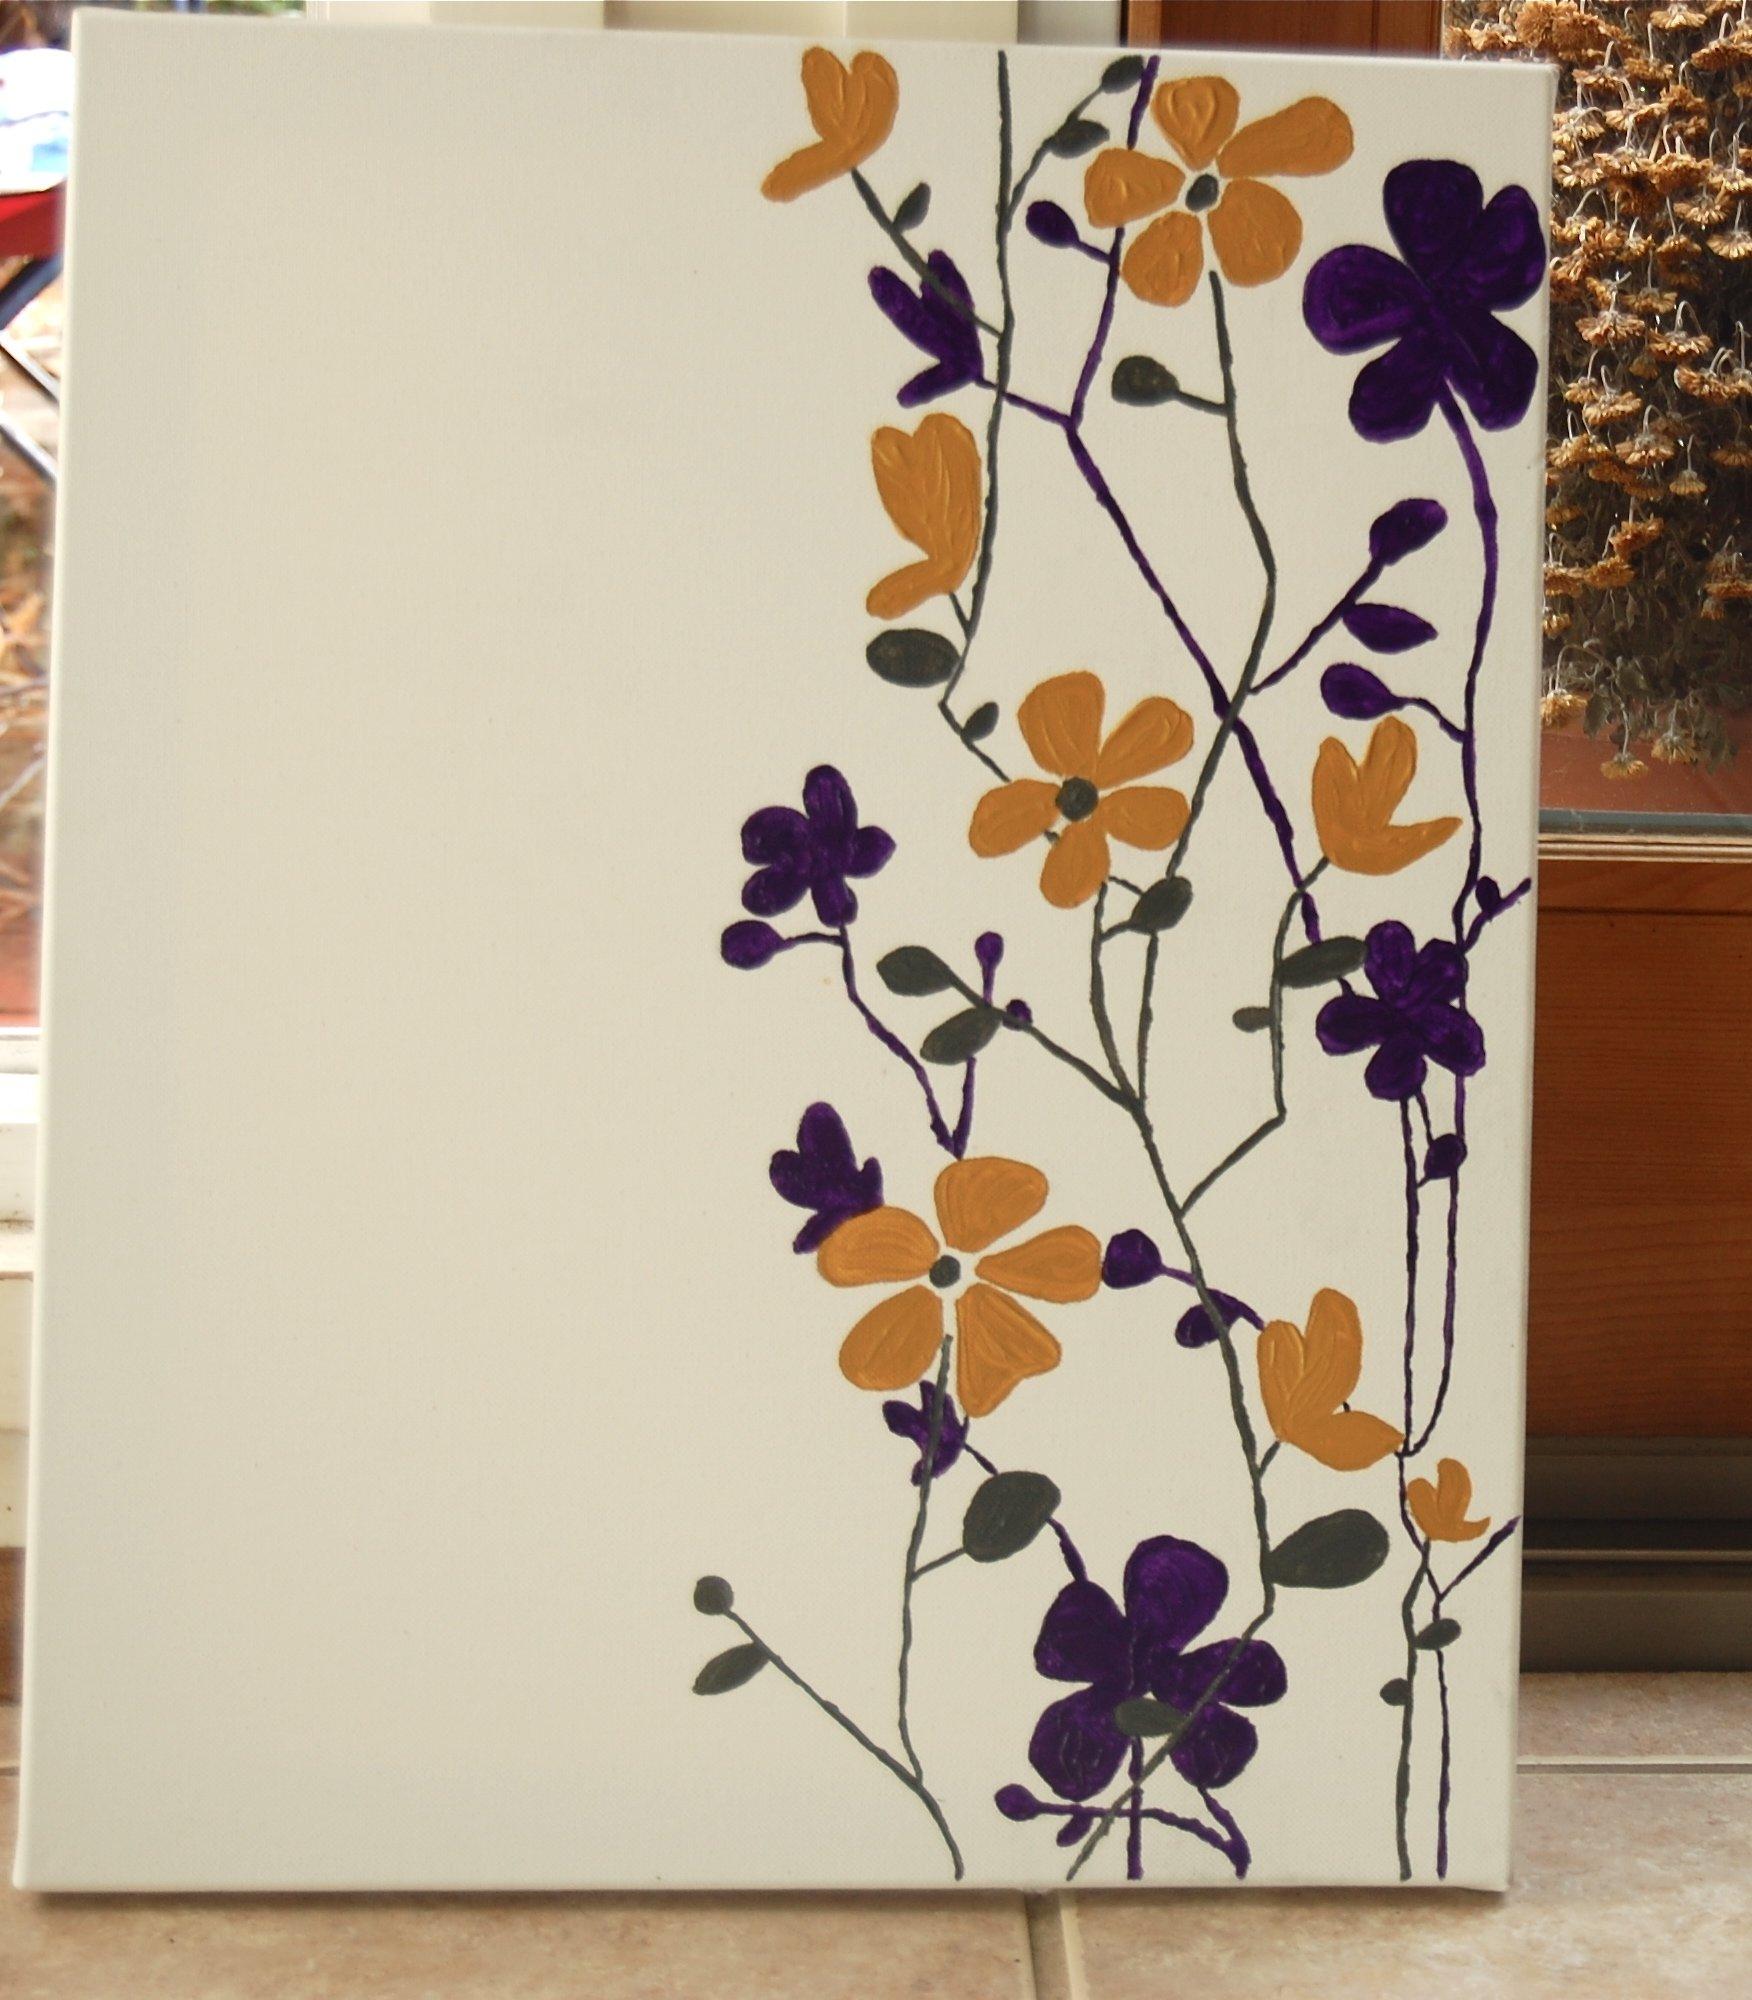 10 Stylish Easy Diy Canvas Painting Ideas simple canvas painting designs diy easy ideas home dma homes 91398 2020